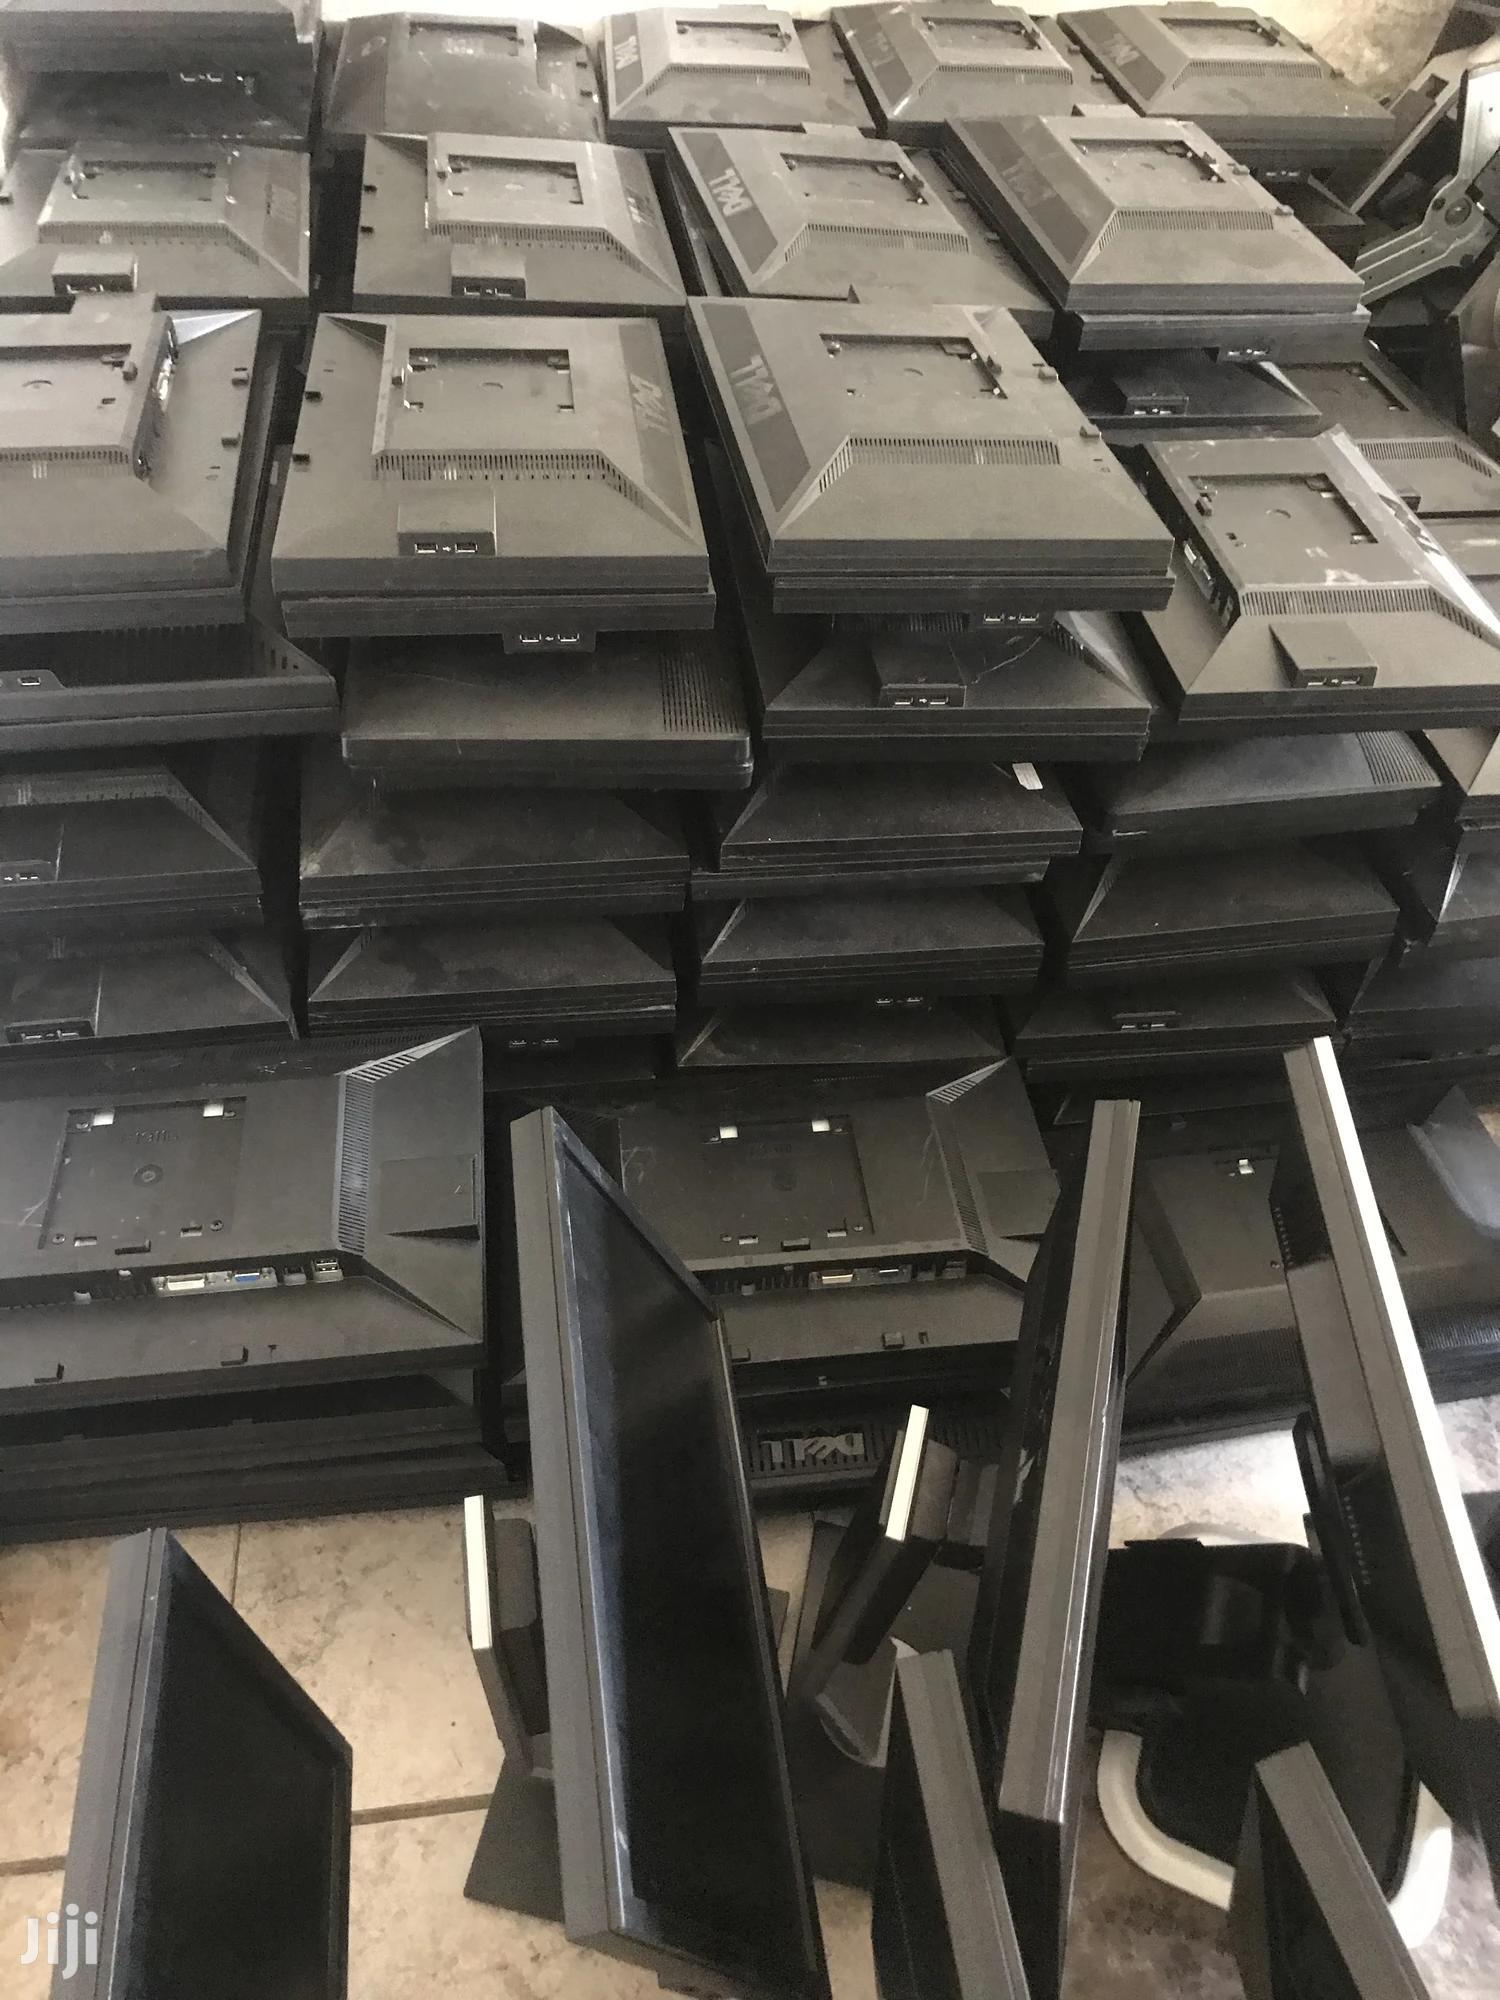 Archive: 19 Inch Dell LCD Monitors